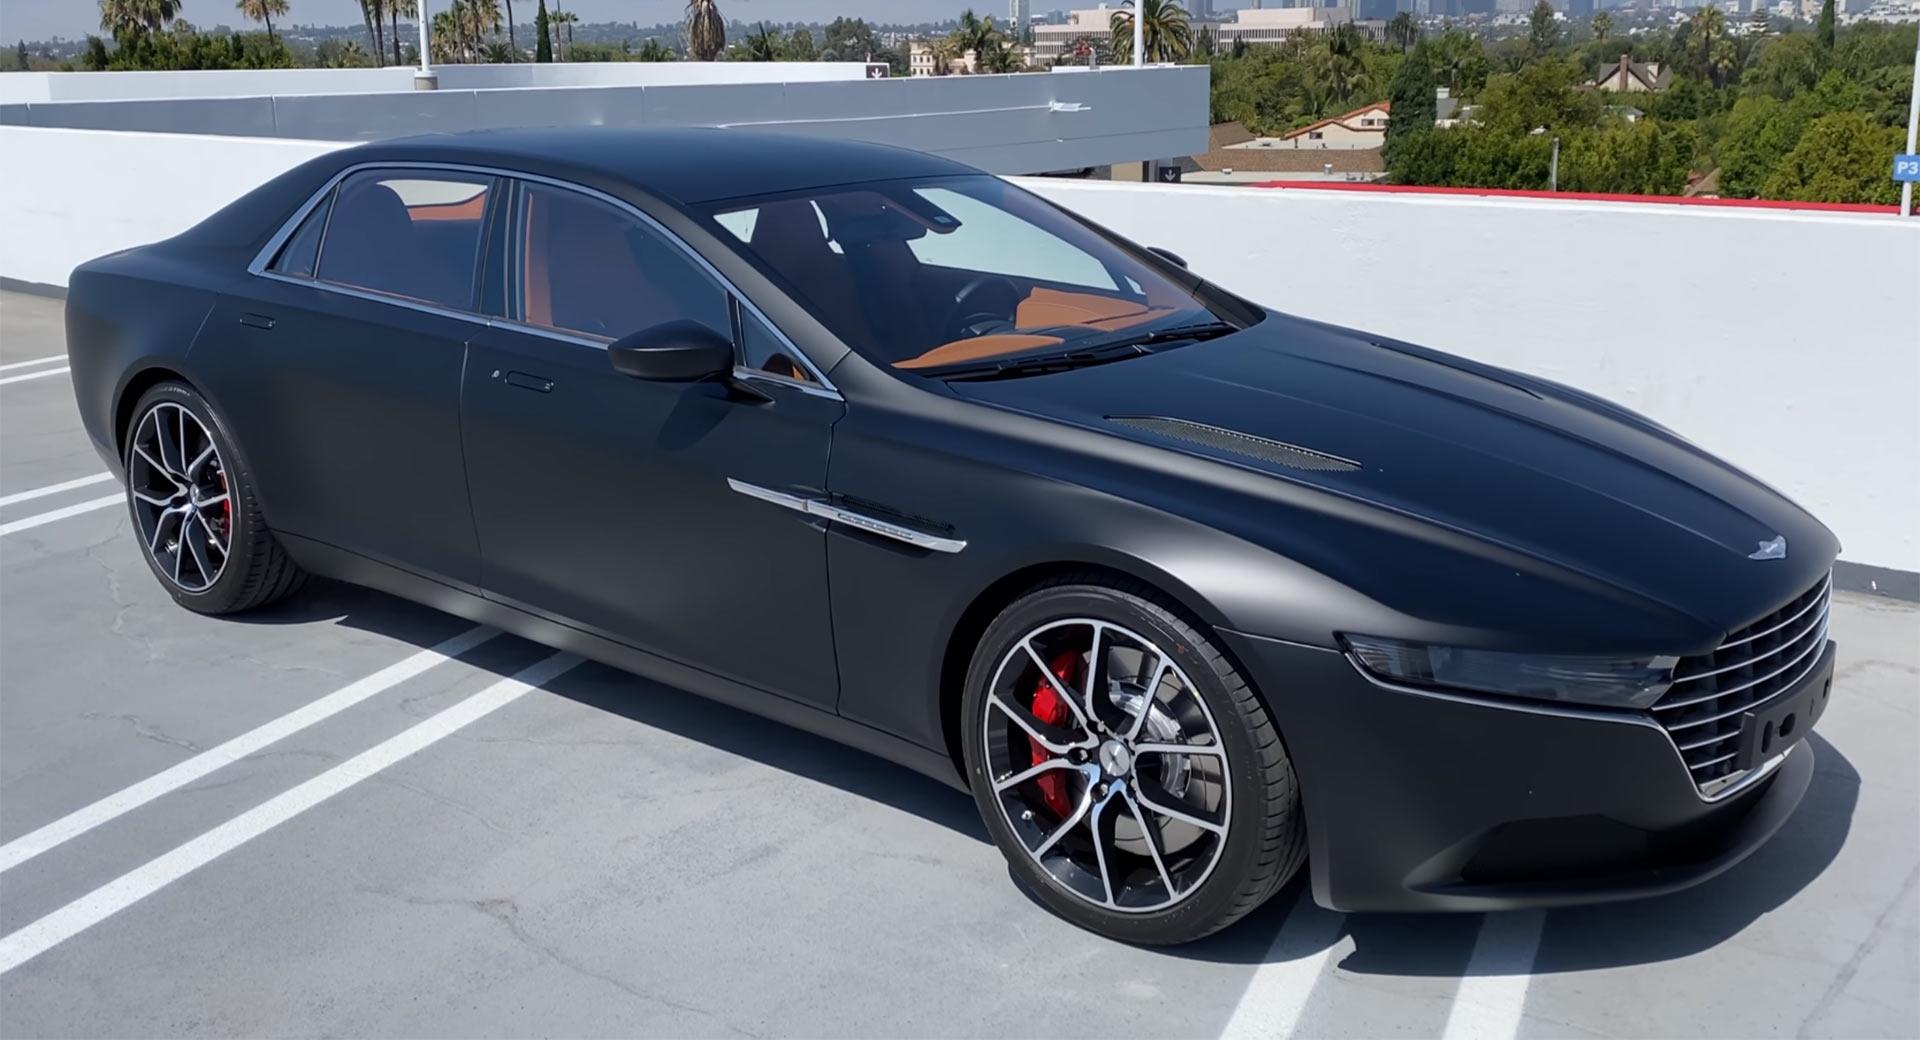 Aston Martin Lagonda Taraf Meet The World S Most Expensive Luxury Sedan Carscoops